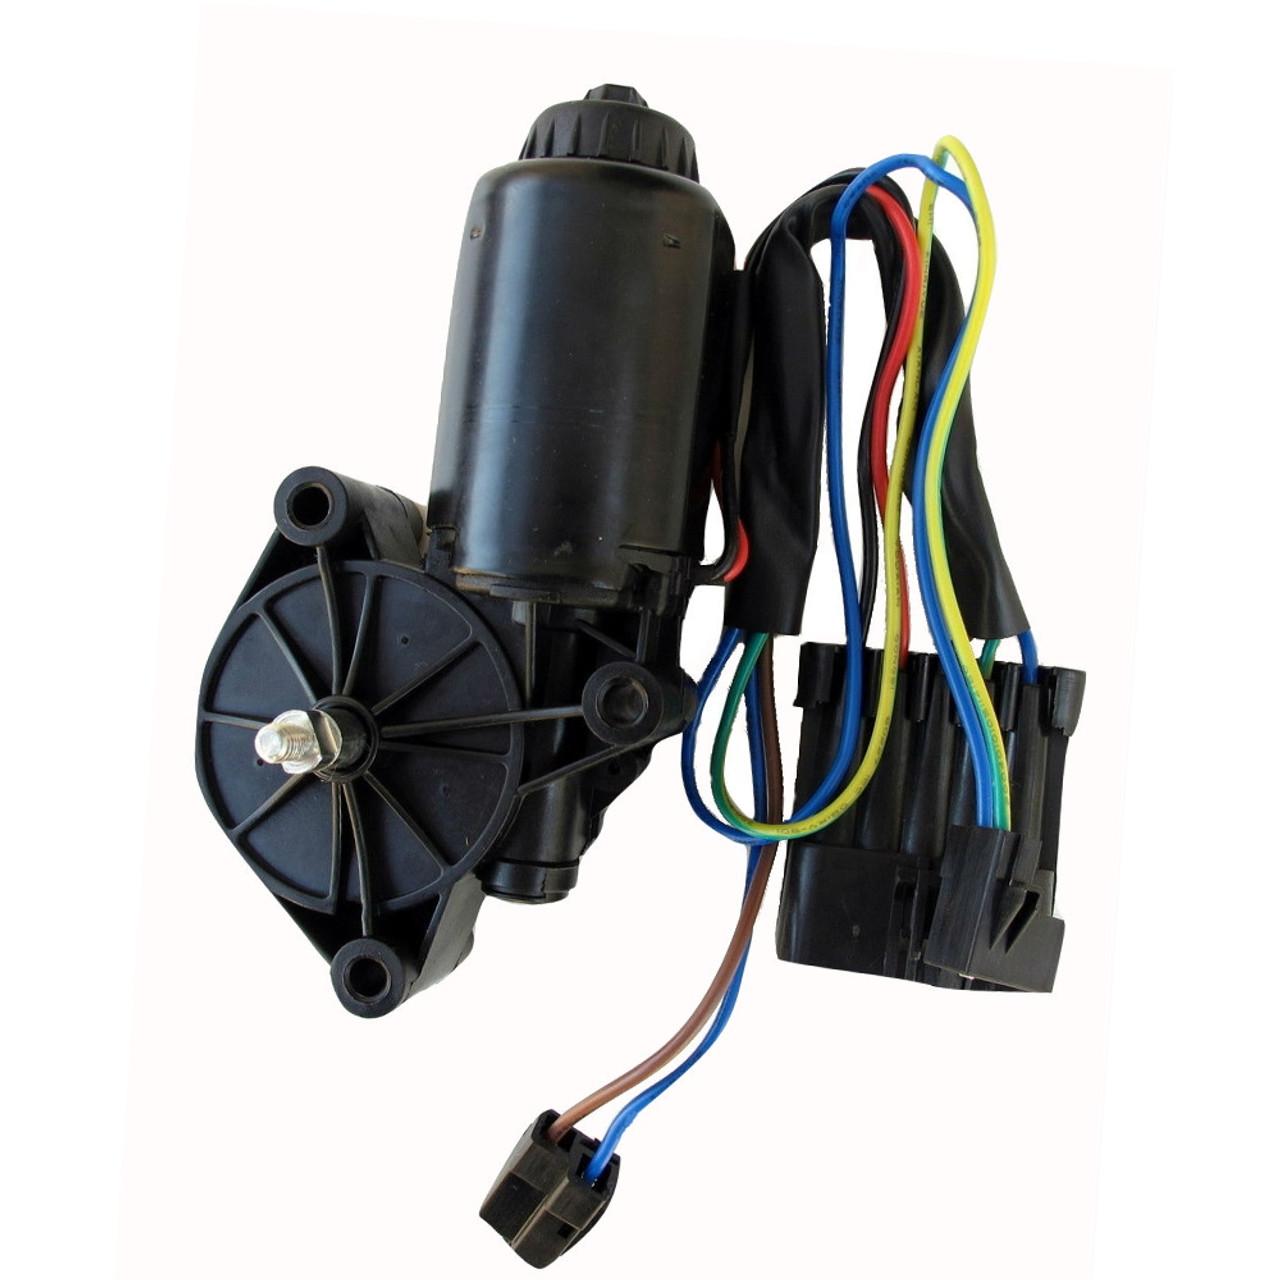 medium resolution of new 1998 2002 firebird headlight actuator motor wire harness rh westcoast autoparts com